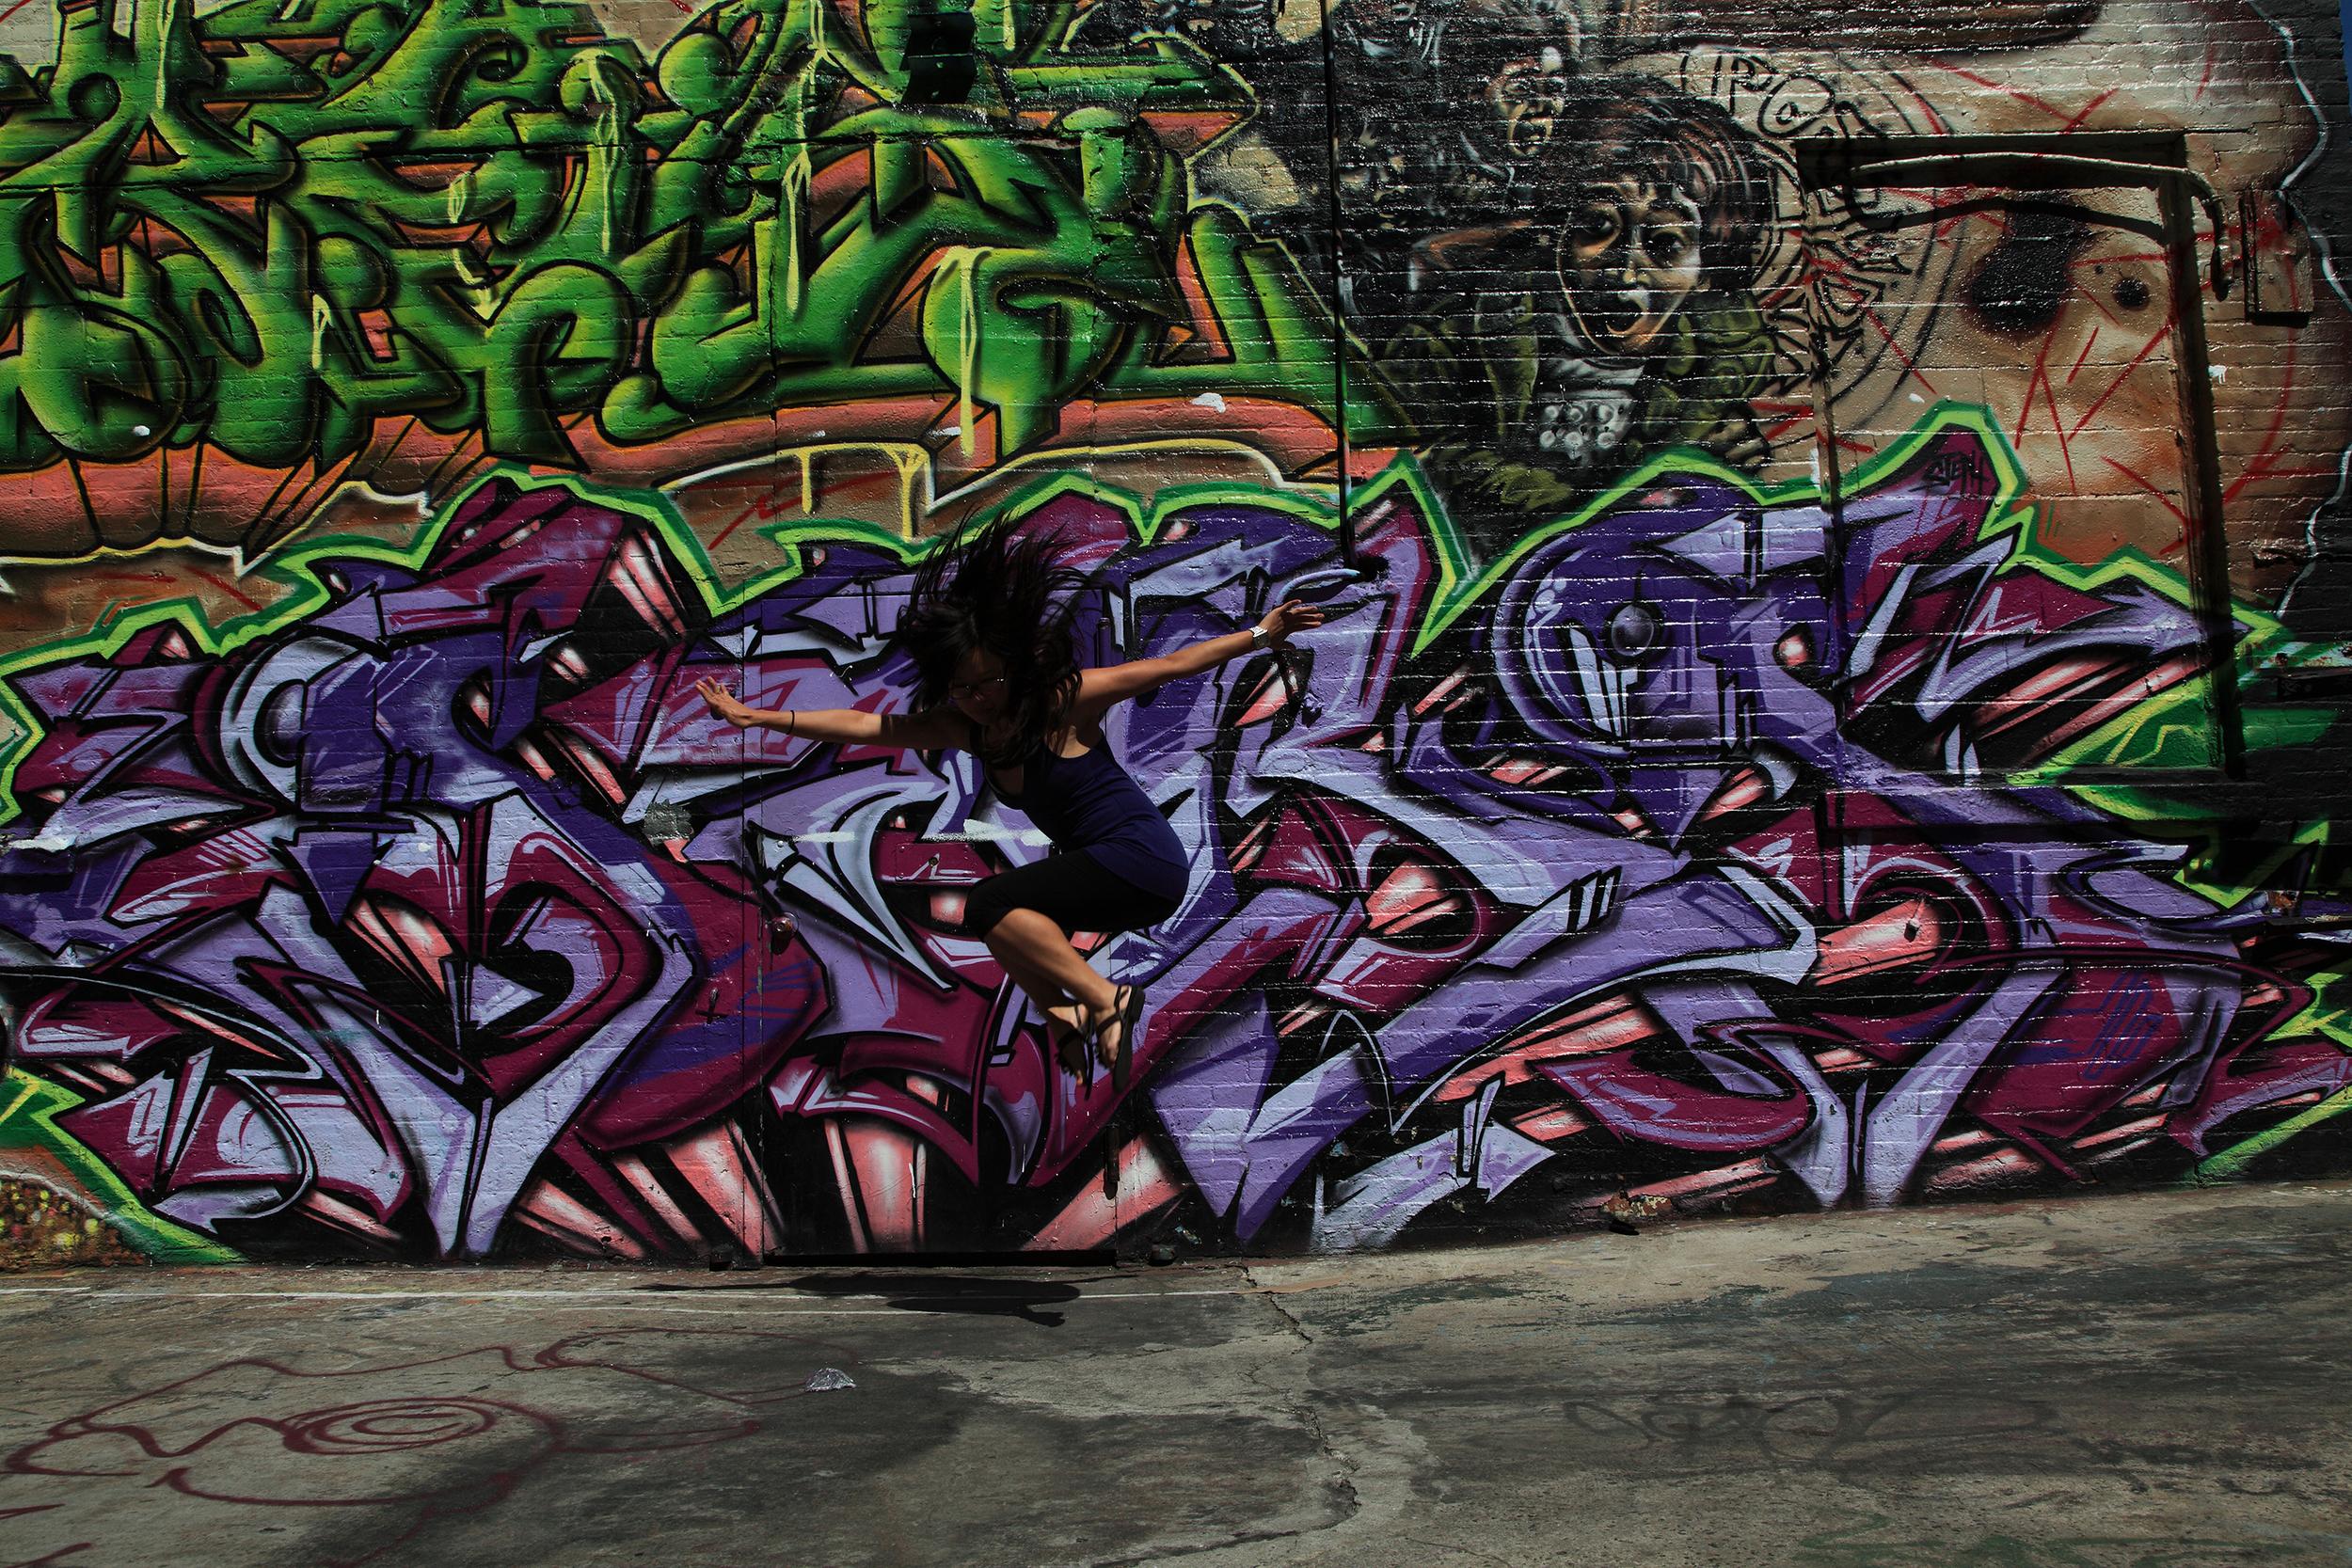 Taken at 5 Pointz, a public art and graffiti mecca.